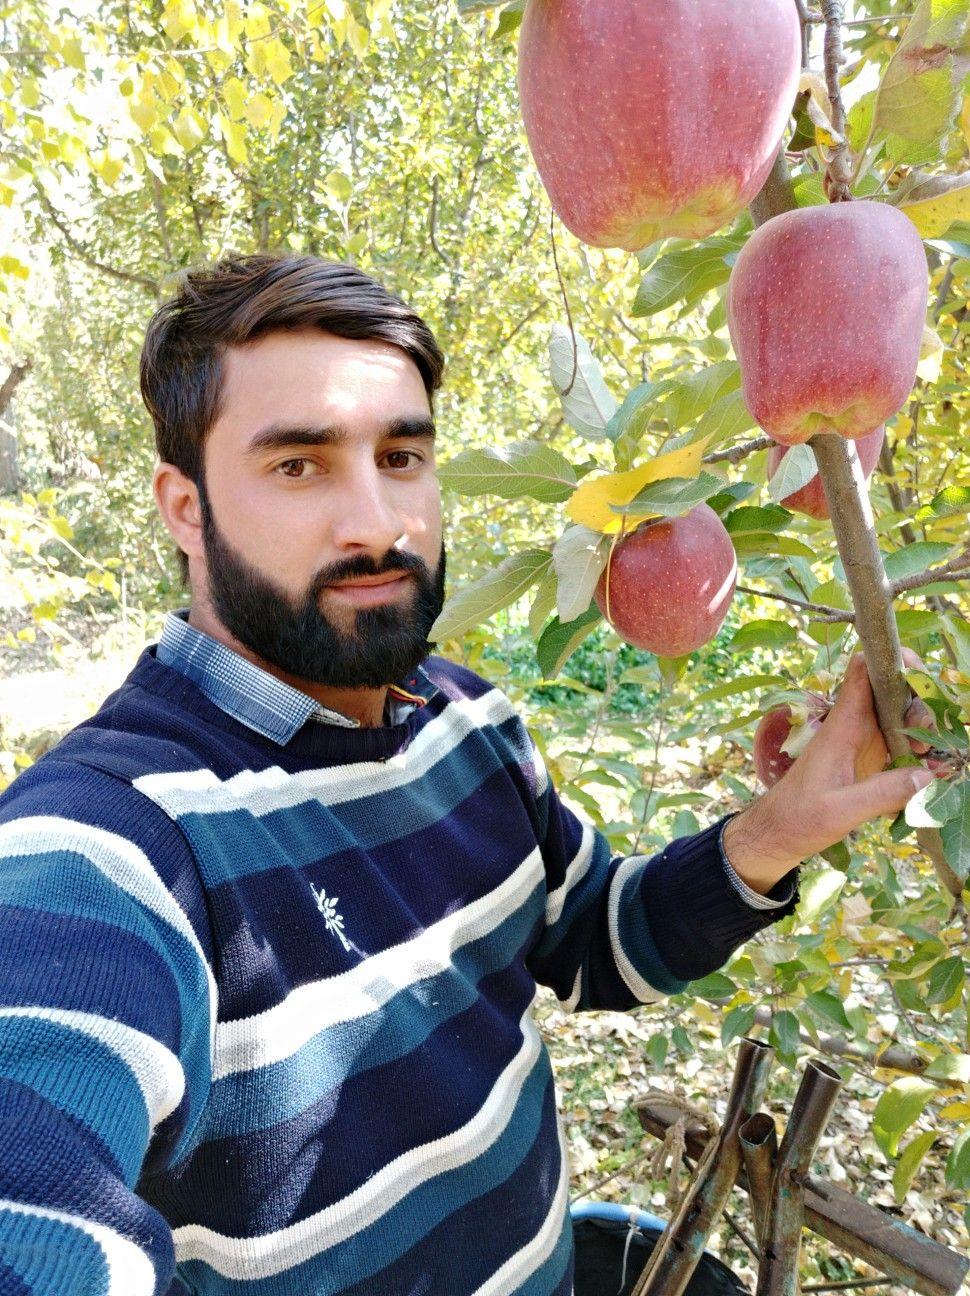 picking apples . Nursing students, Apple, Tree